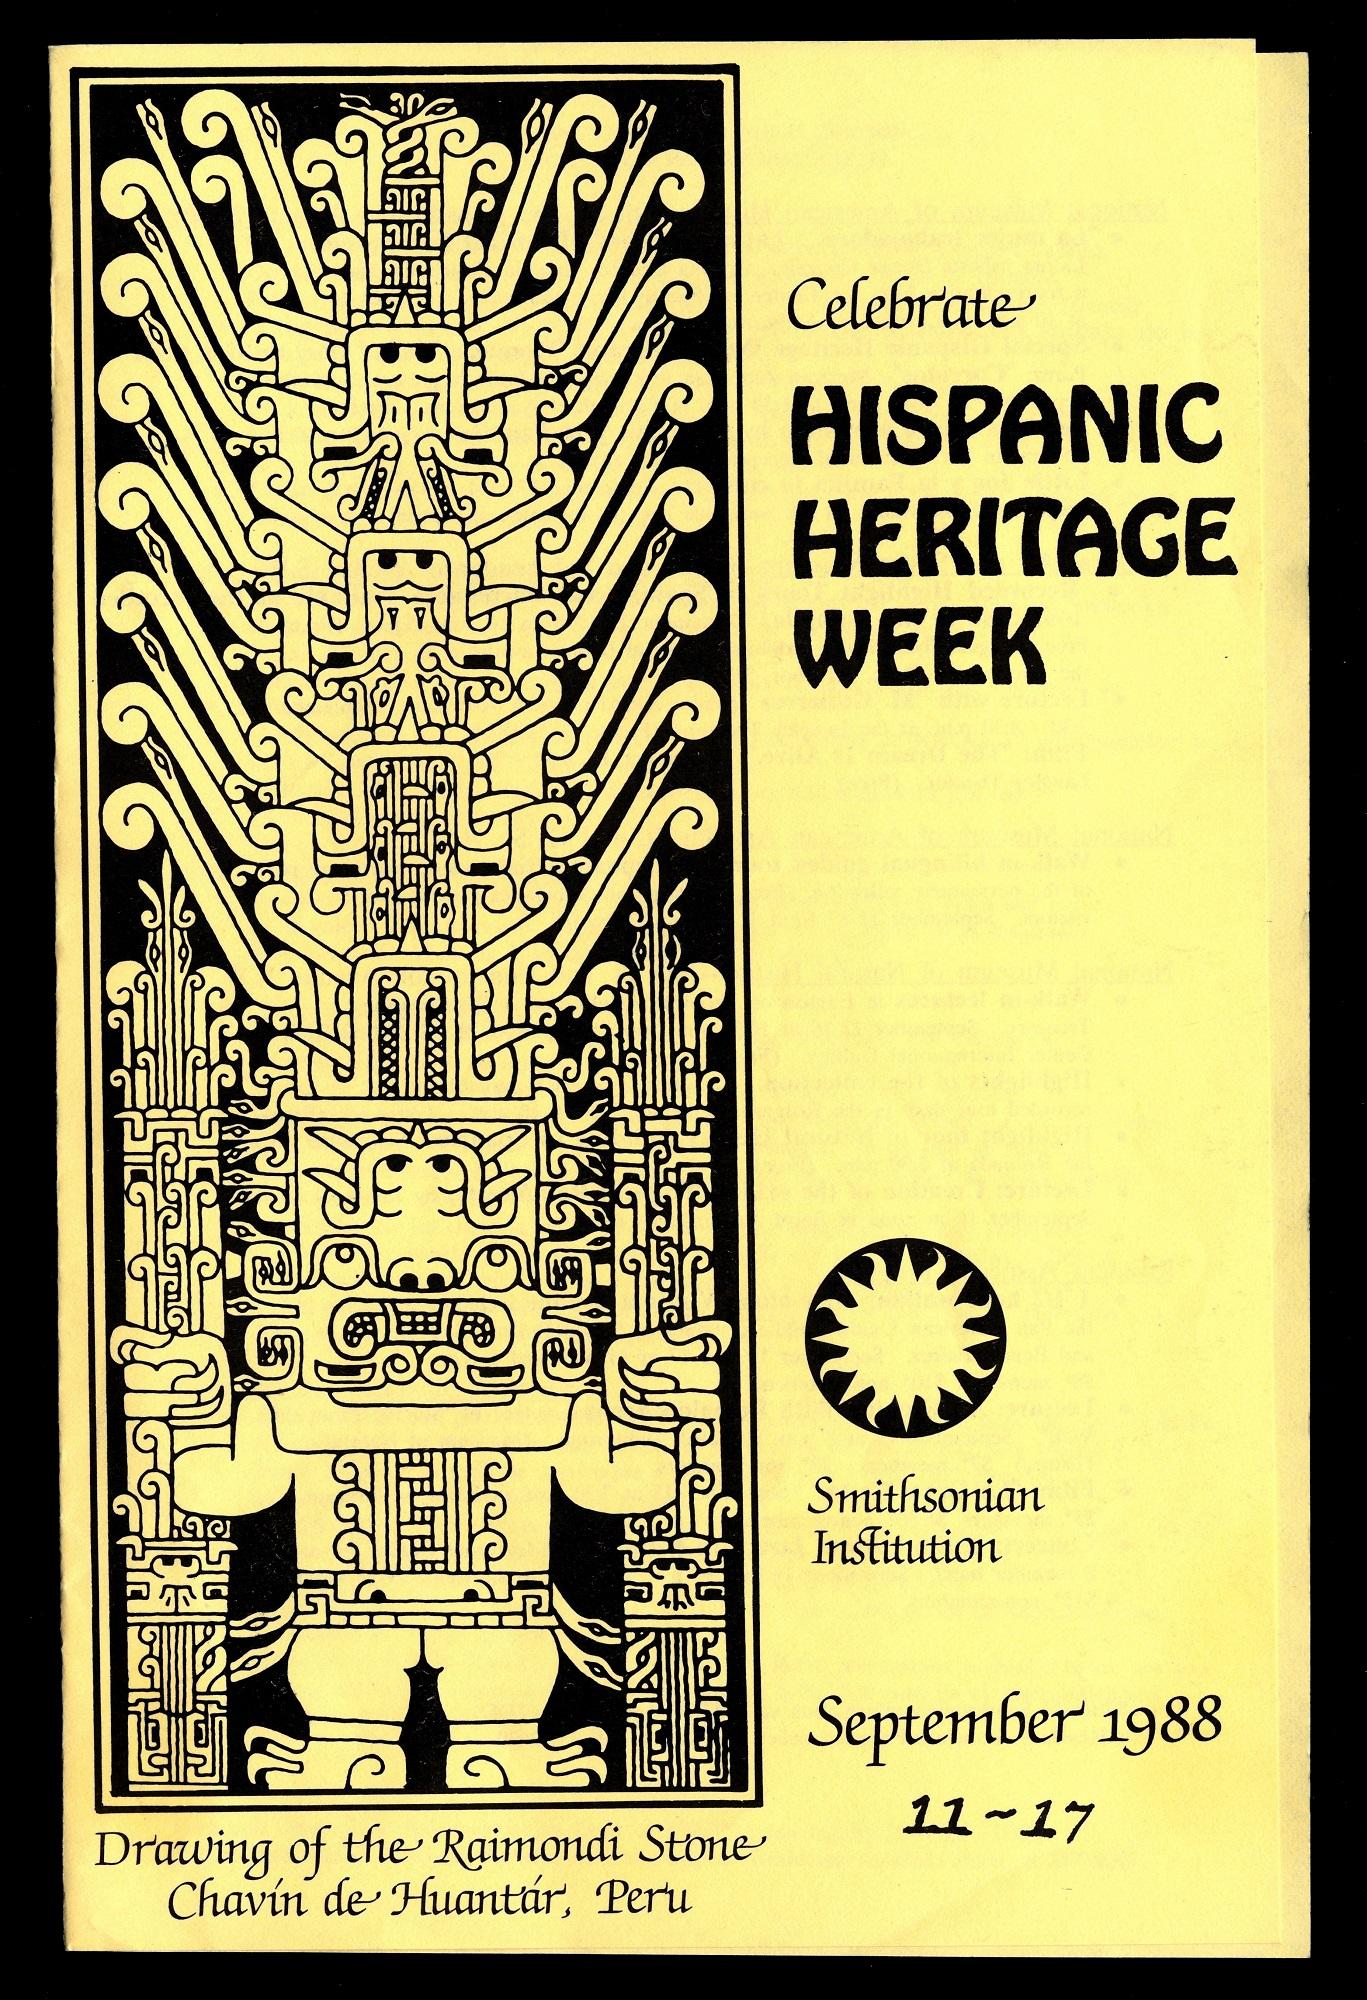 Celebrate Hispanic Heritage Week, brochure, 1988.